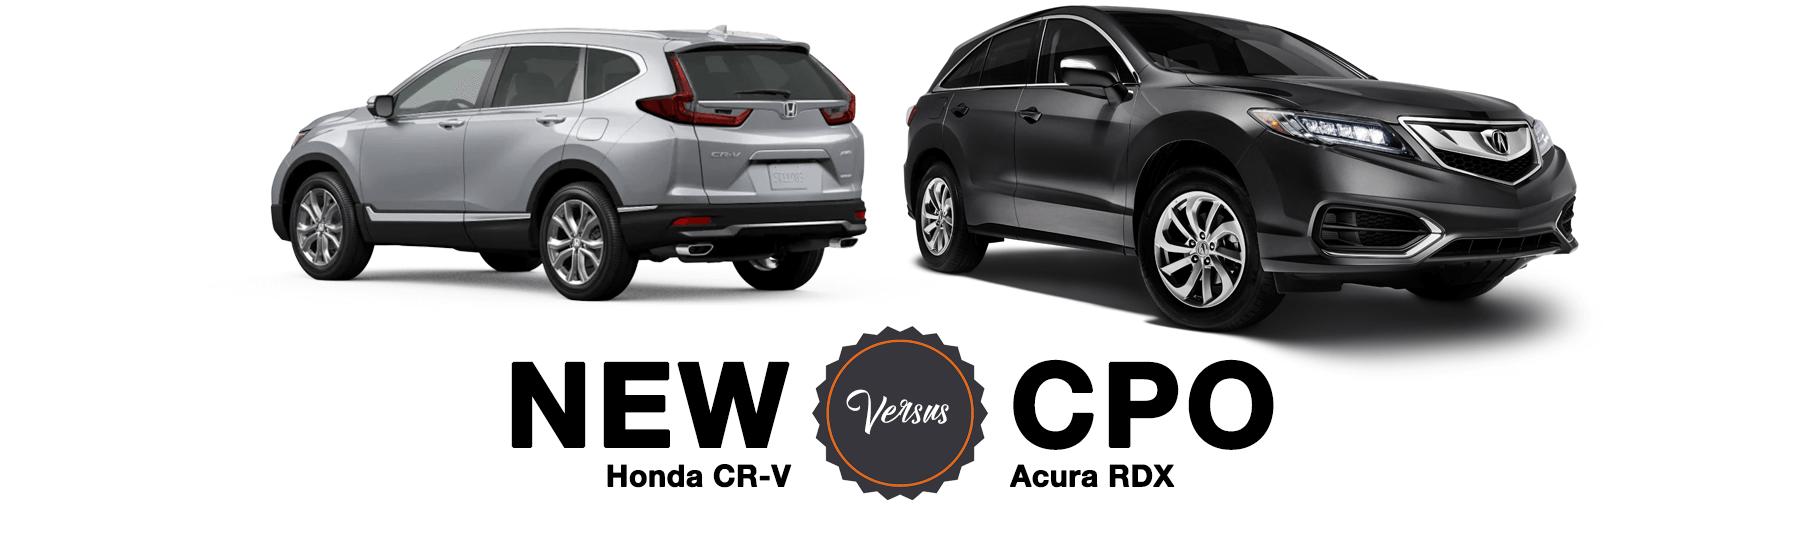 New Honda CR-V Versus CPO Acura RDX